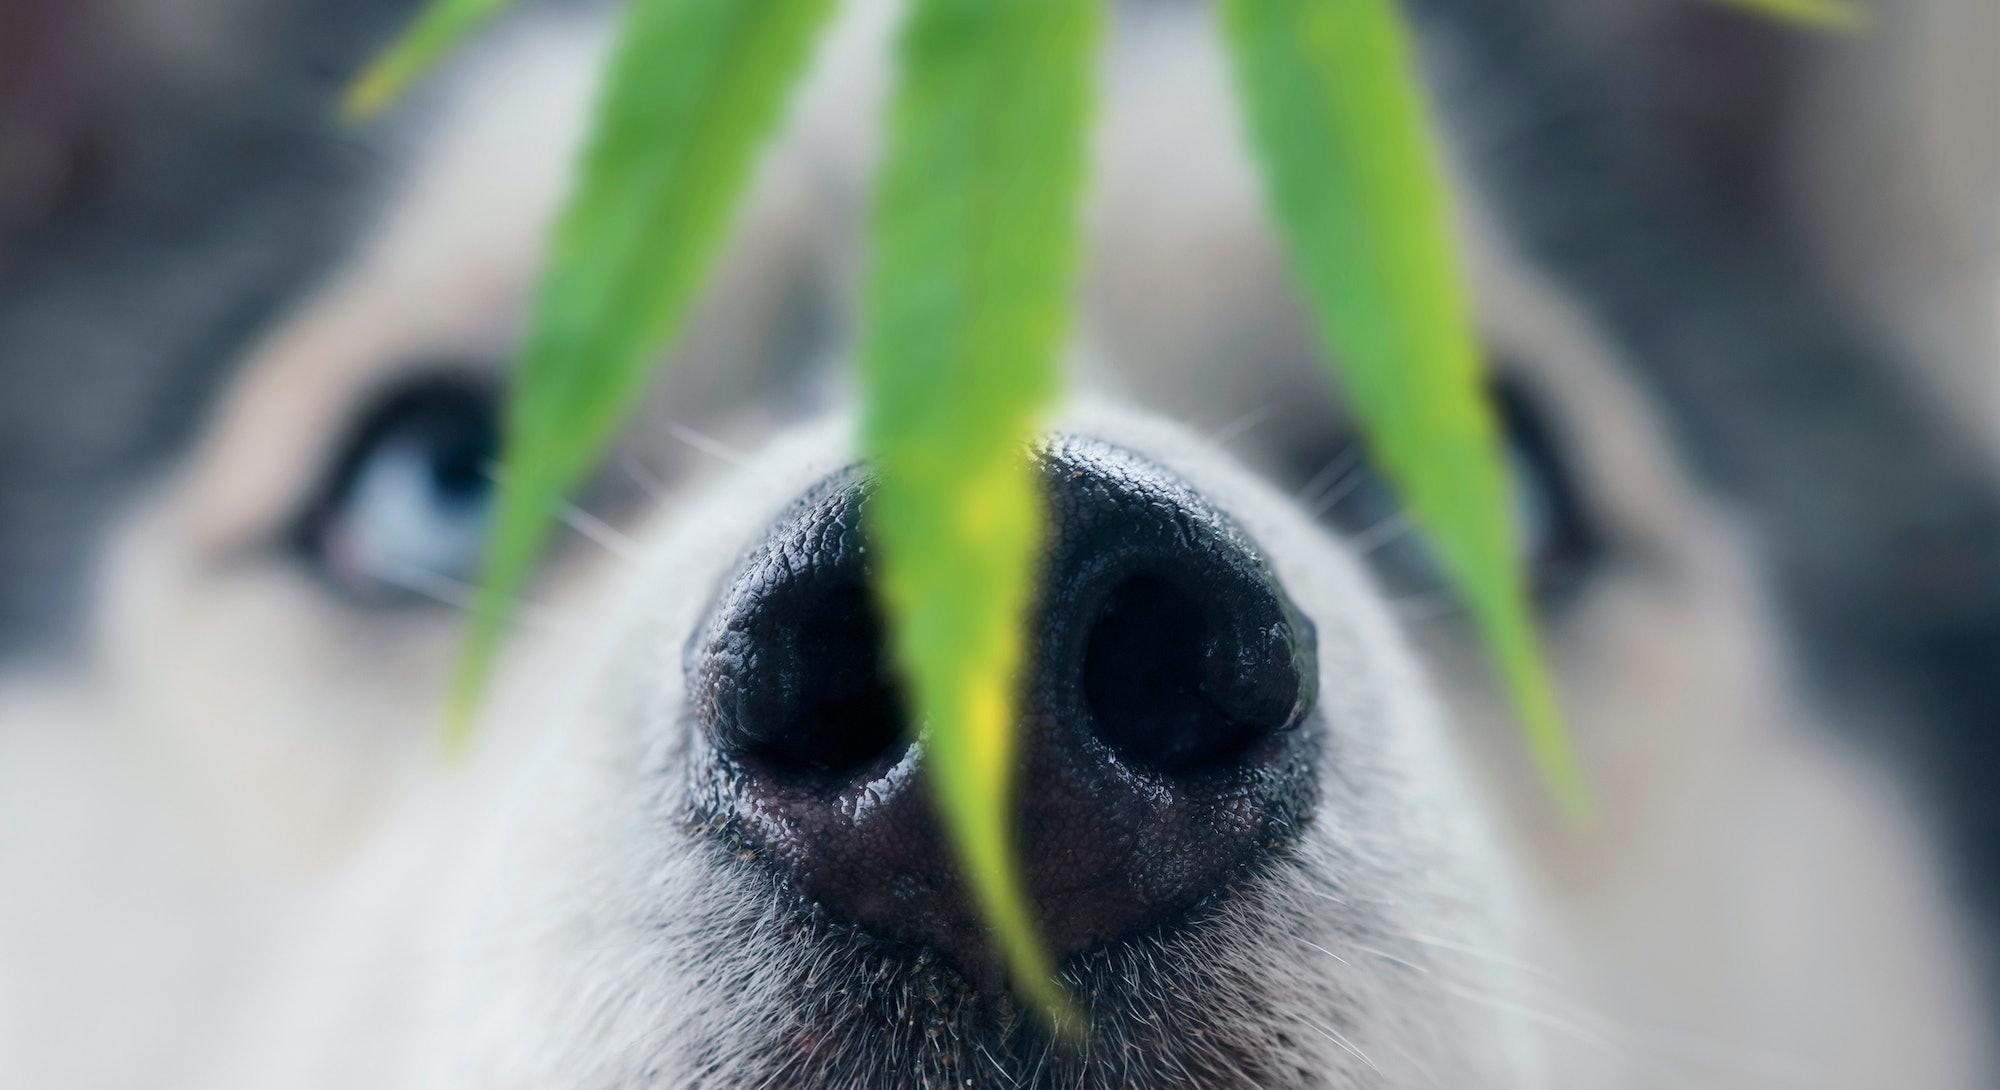 Husky dog sniffing a leaf of marijuana